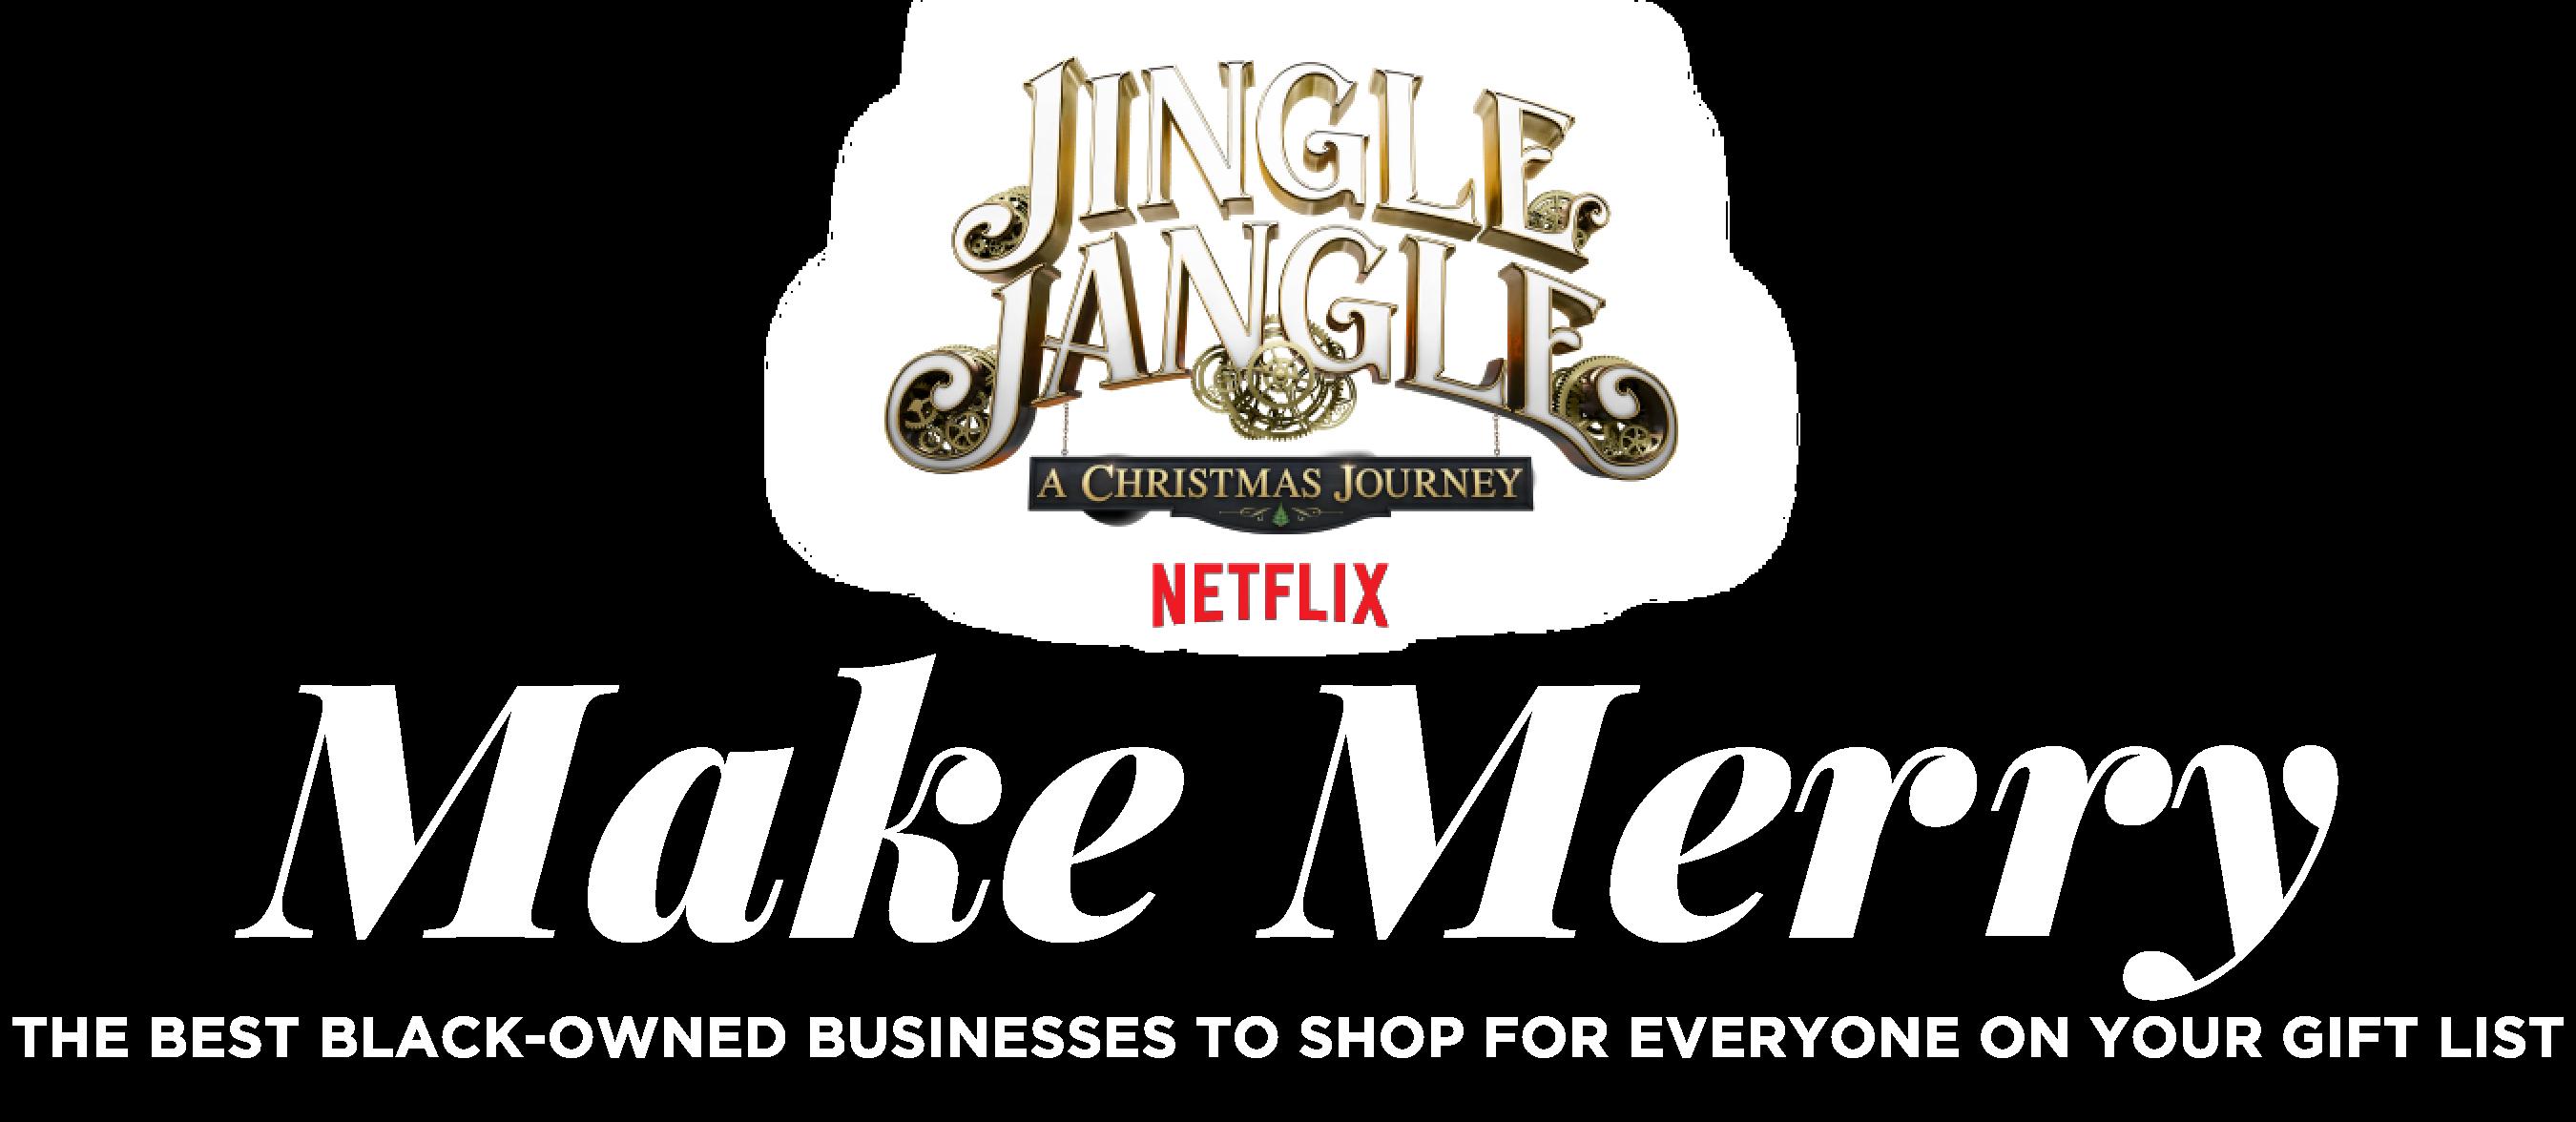 Jingle Jangle Holiday Gift Guide